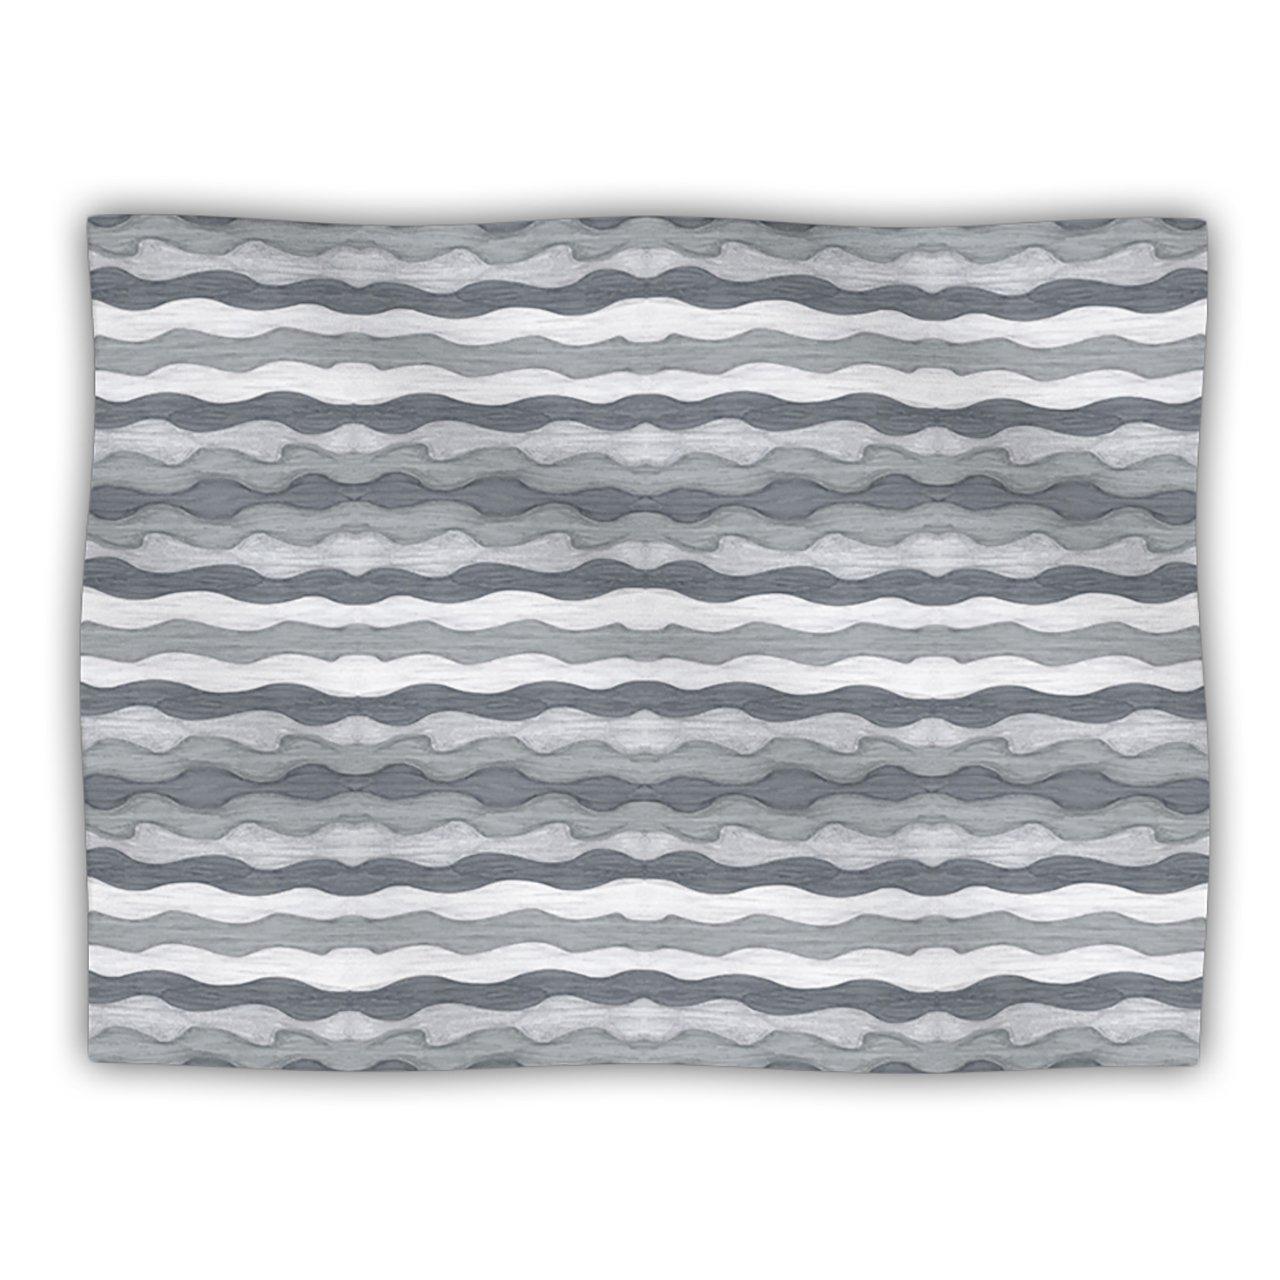 Kess InHouse Empire Ruhl ''51 Shades of Gray'' Gray White Pet Blanket, 40 by 30-Inch